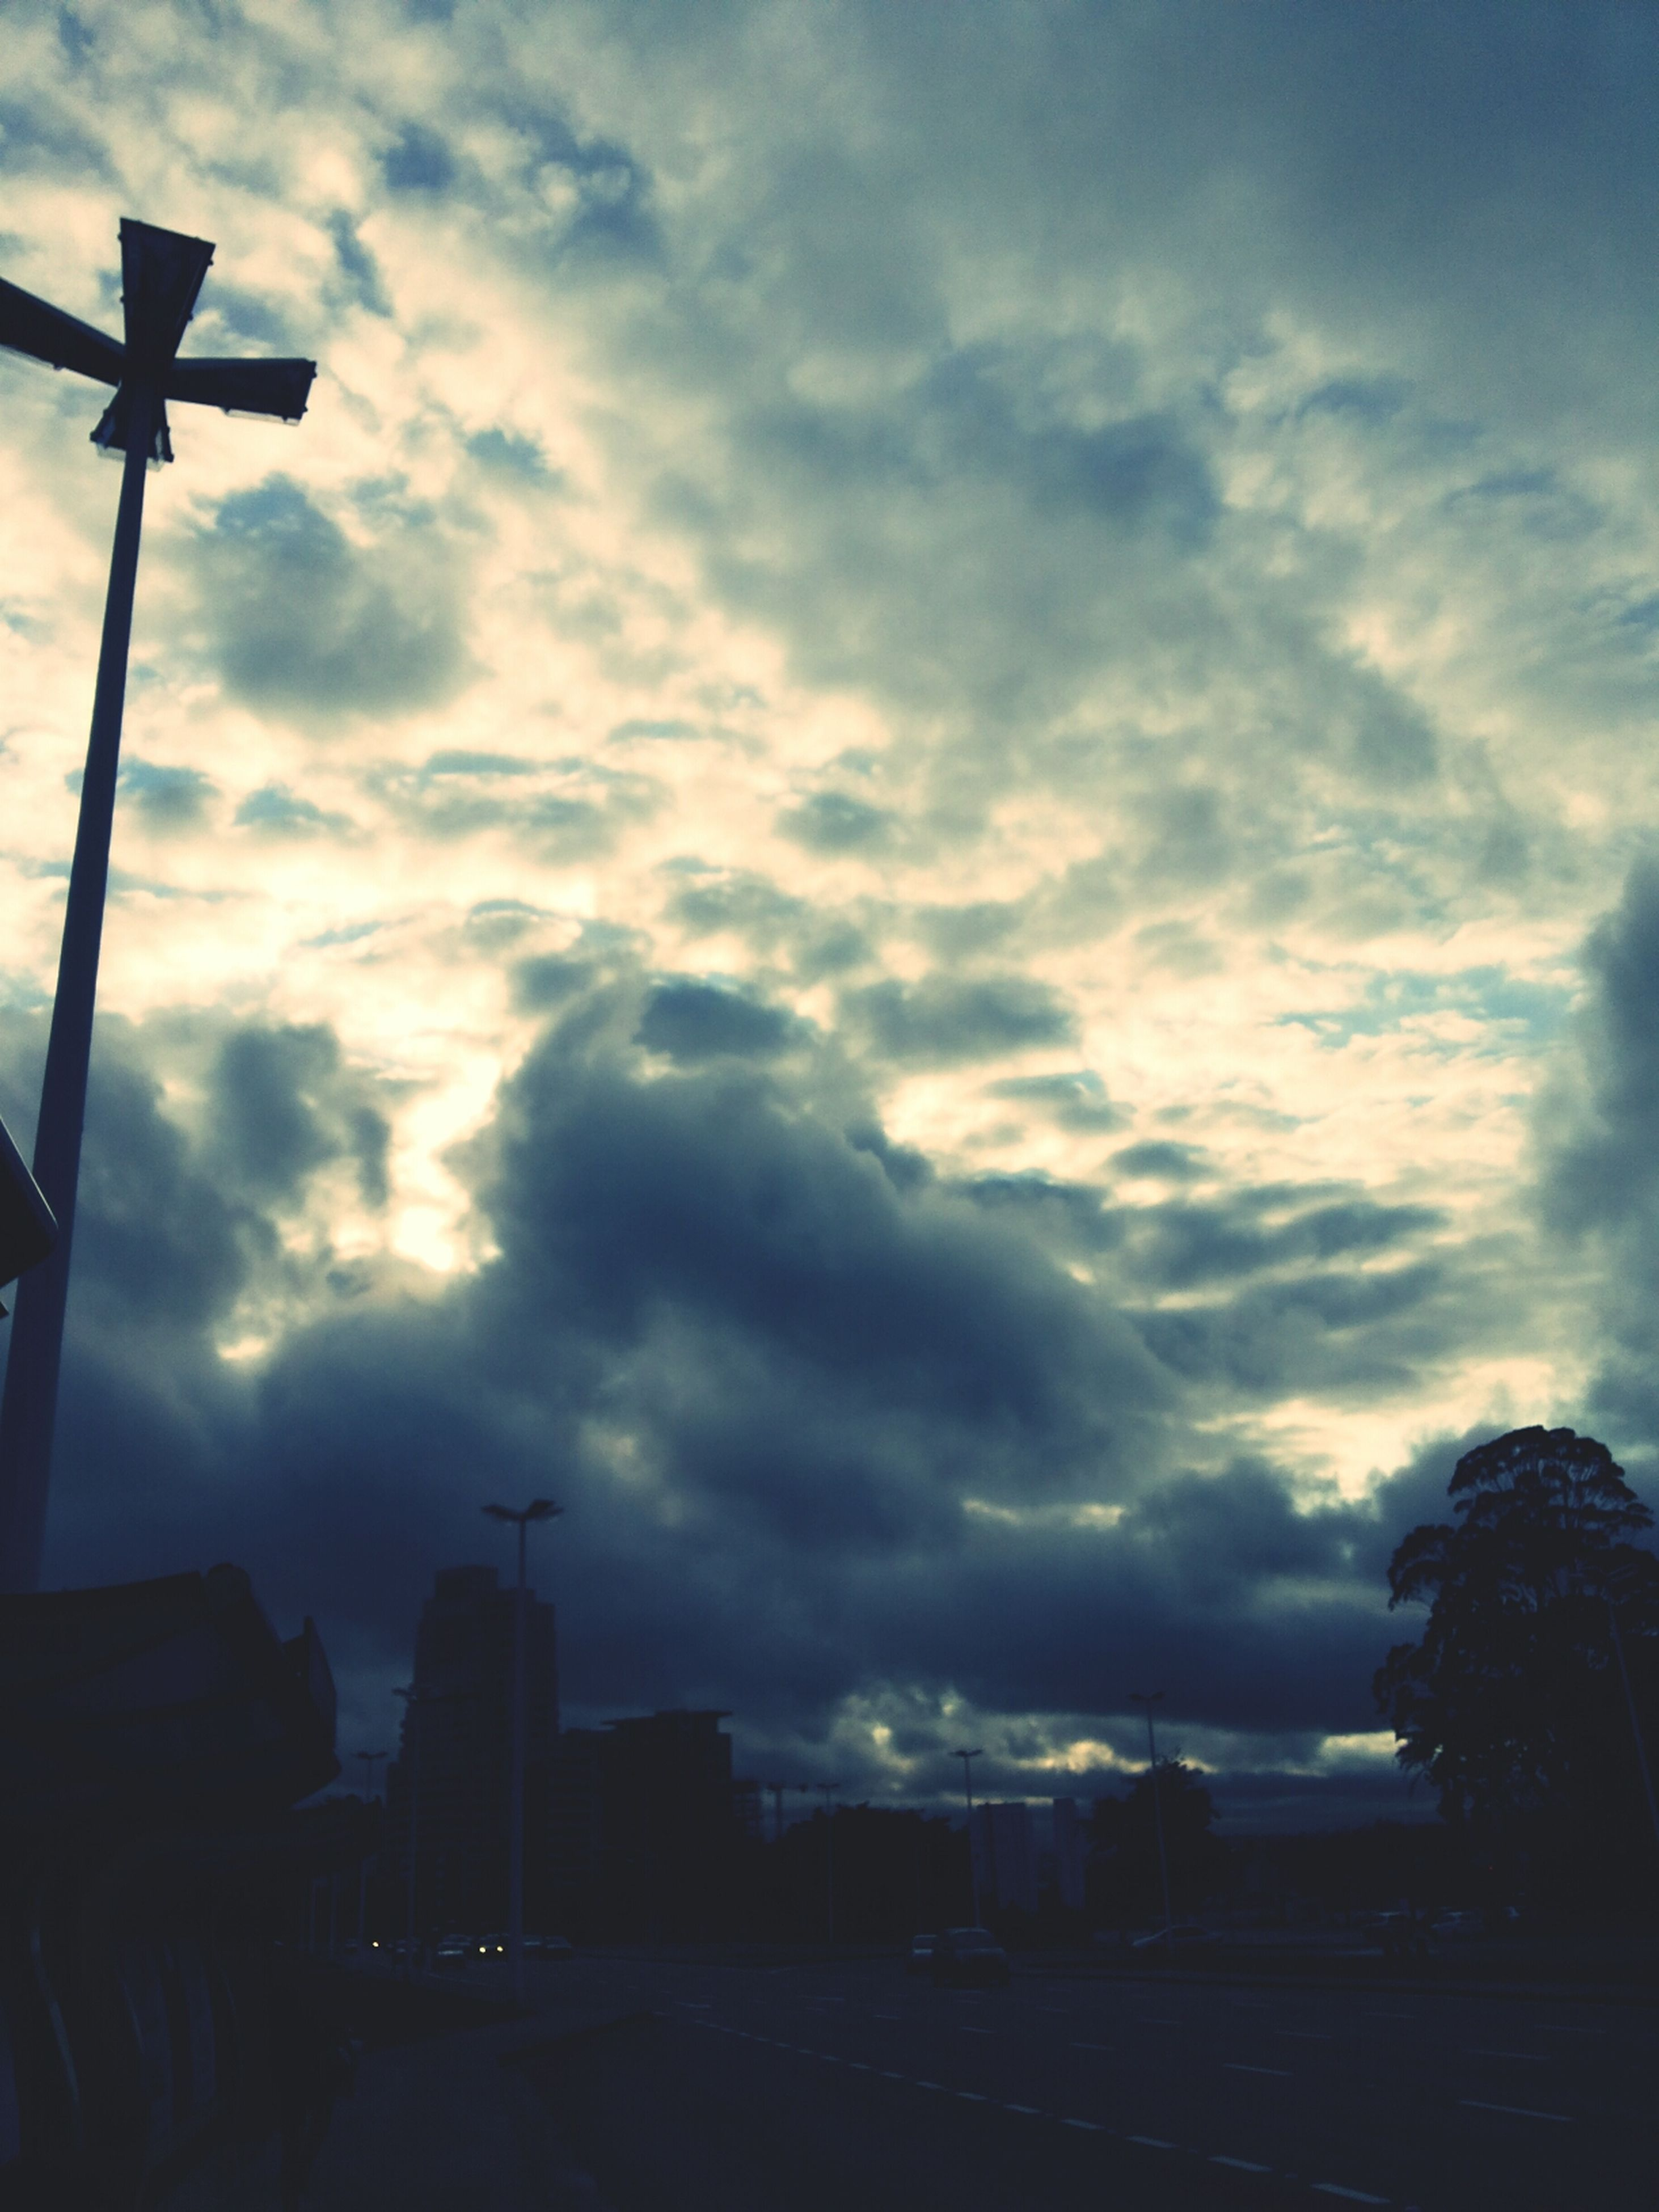 sky, cloud - sky, building exterior, silhouette, built structure, cloudy, architecture, cloud, sunset, transportation, street light, city, low angle view, weather, car, street, dusk, land vehicle, road, building